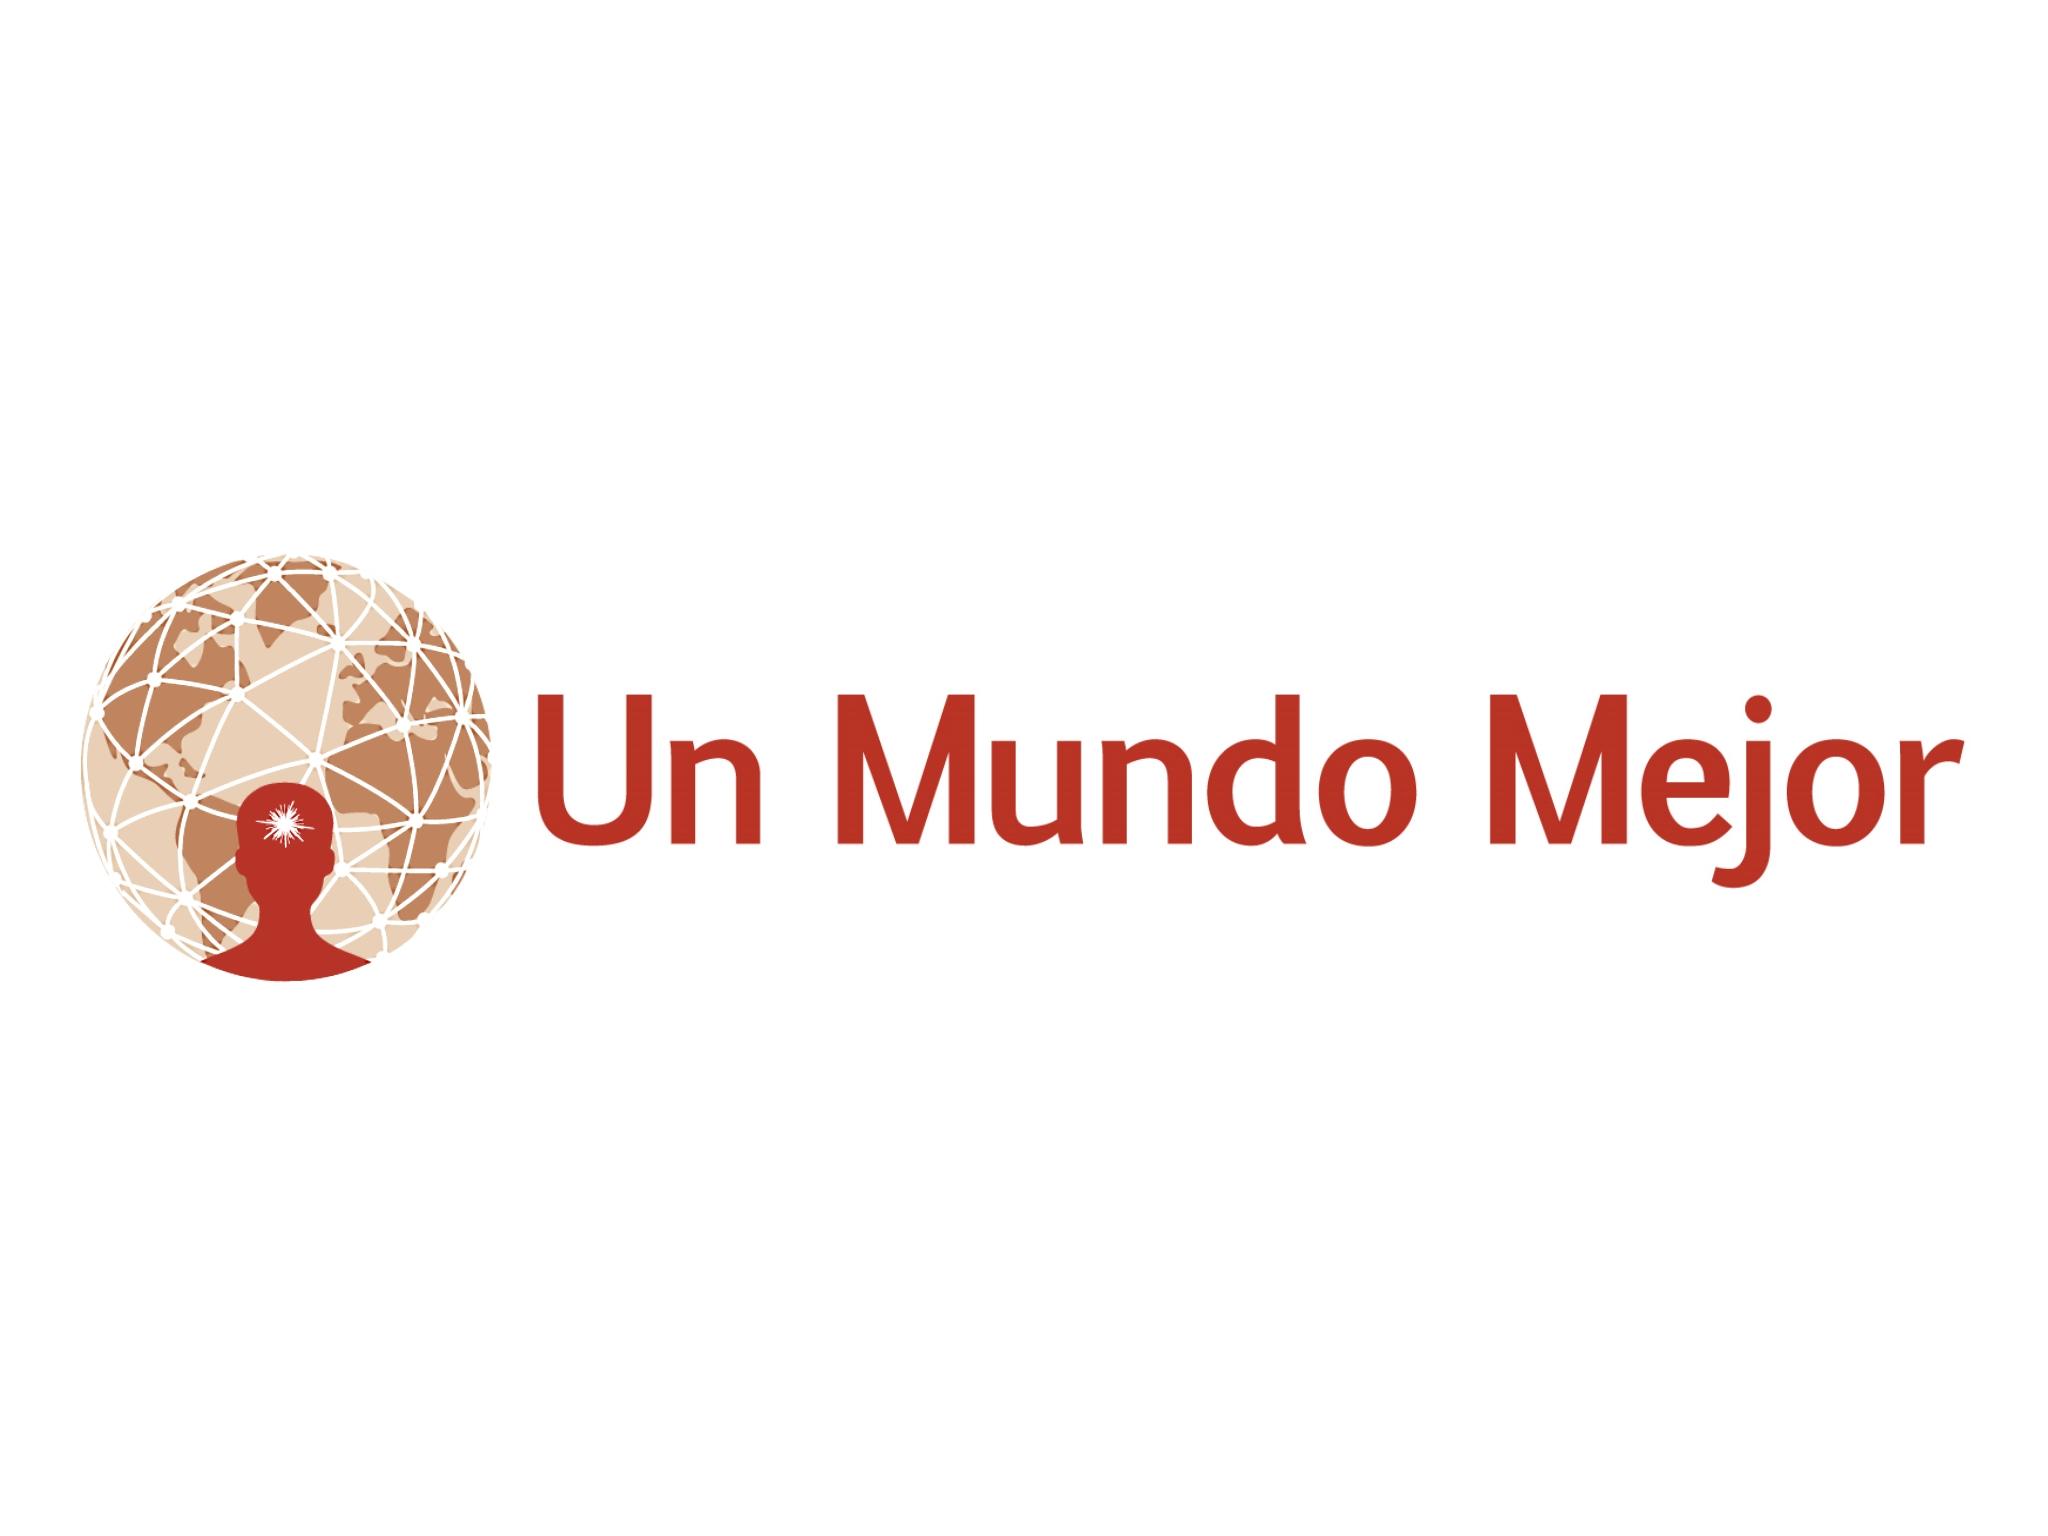 unmundomejor_horizontal